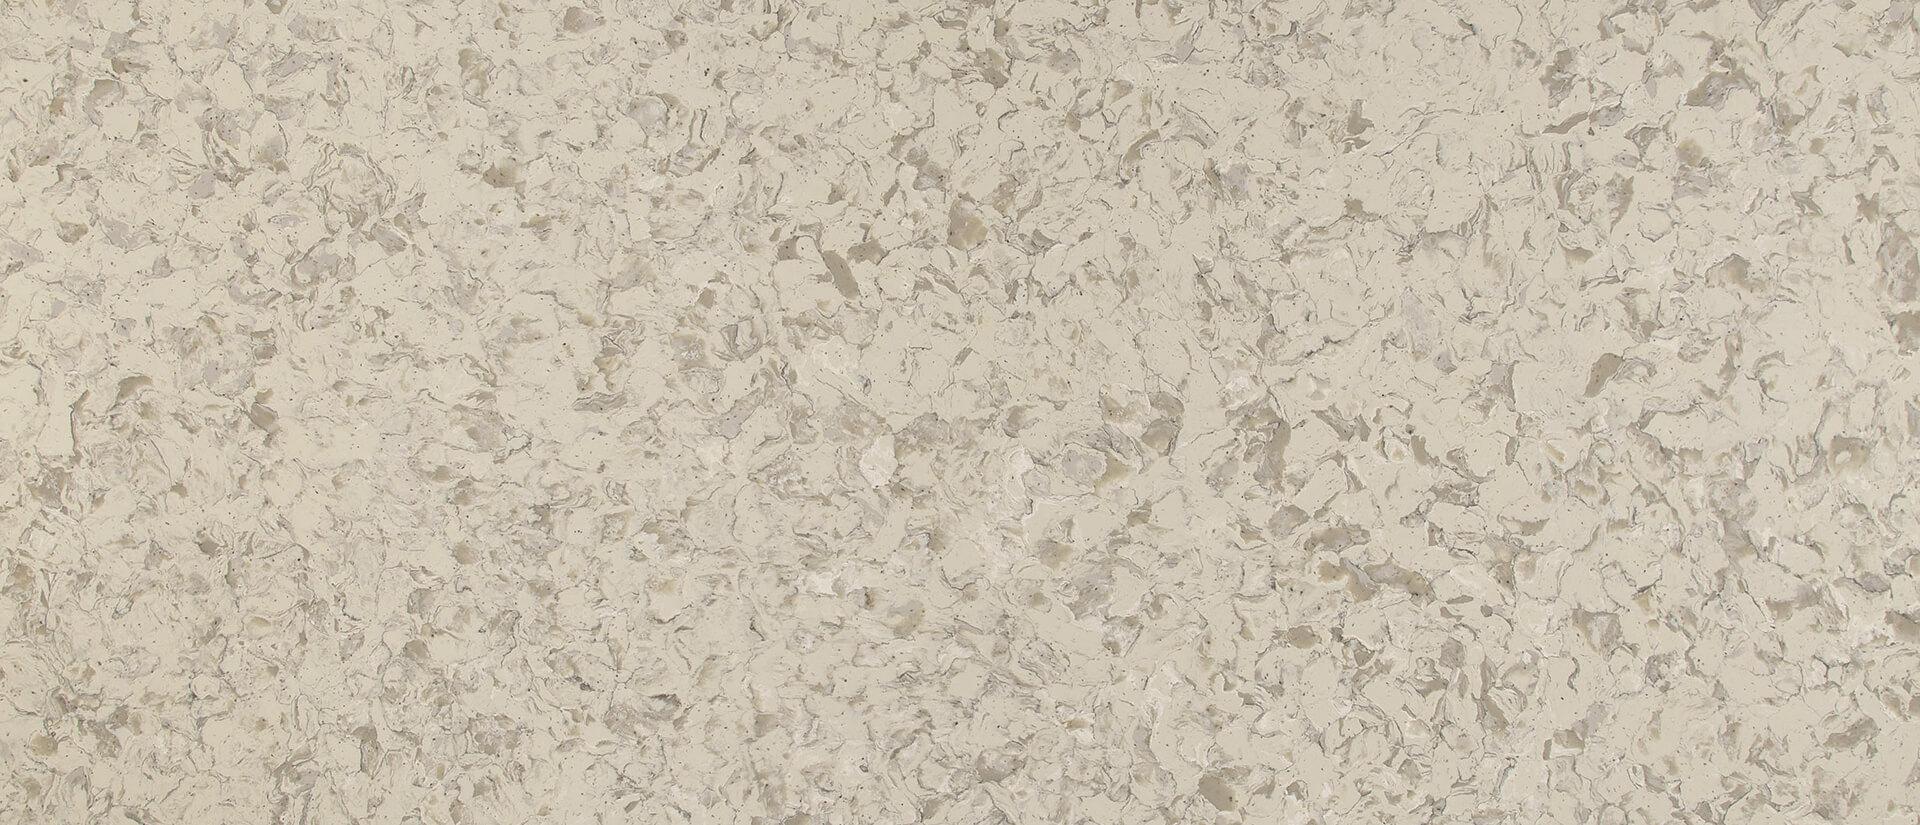 Q Quartz Sedona Stone And Tile